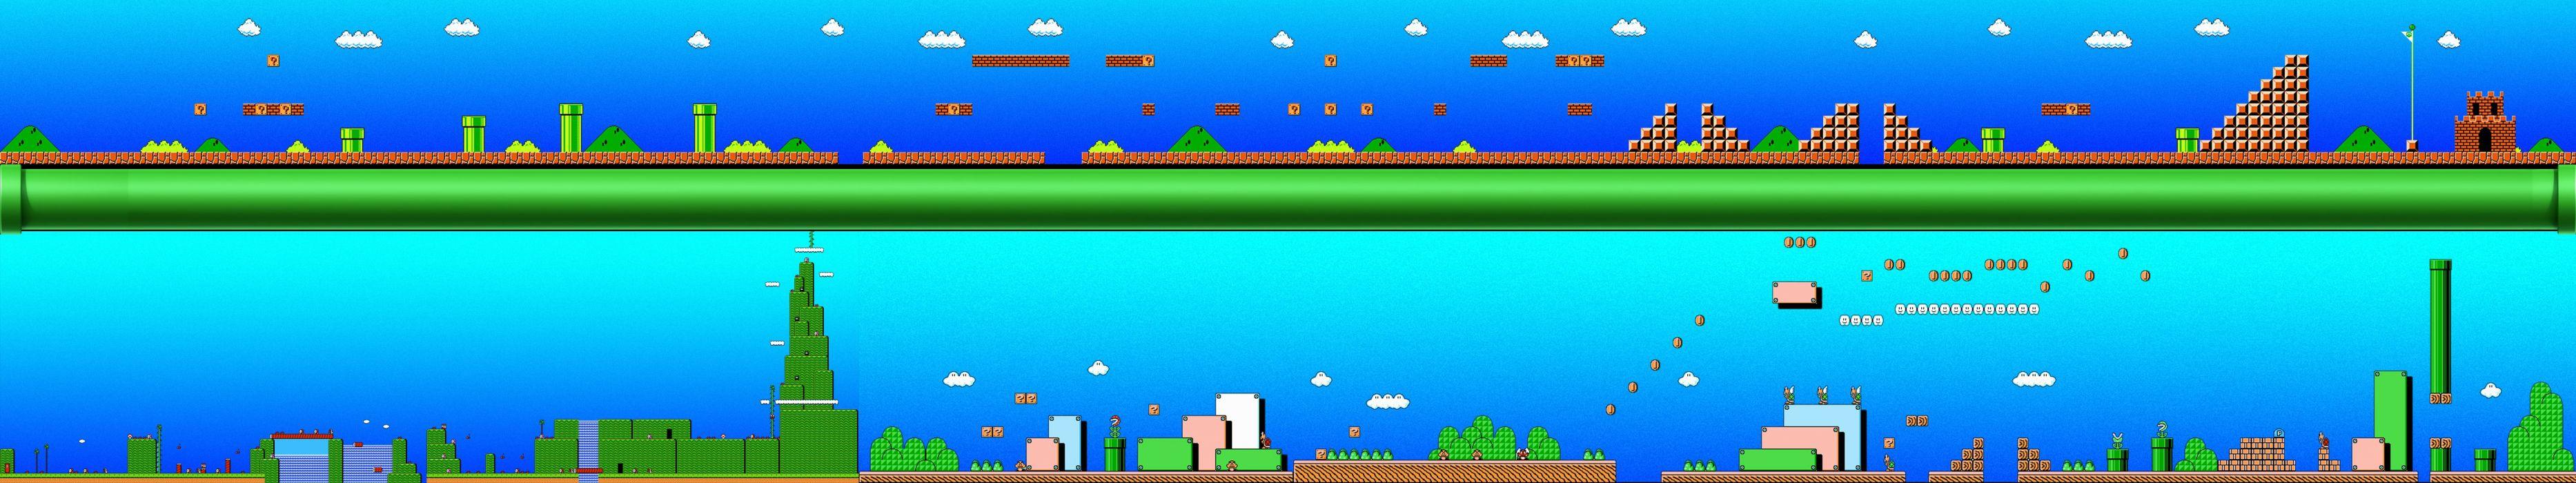 triple screen - multi monitor - multiple - videogame - jeux jeu video - steam - mario - super nintendo - snes wallpaper